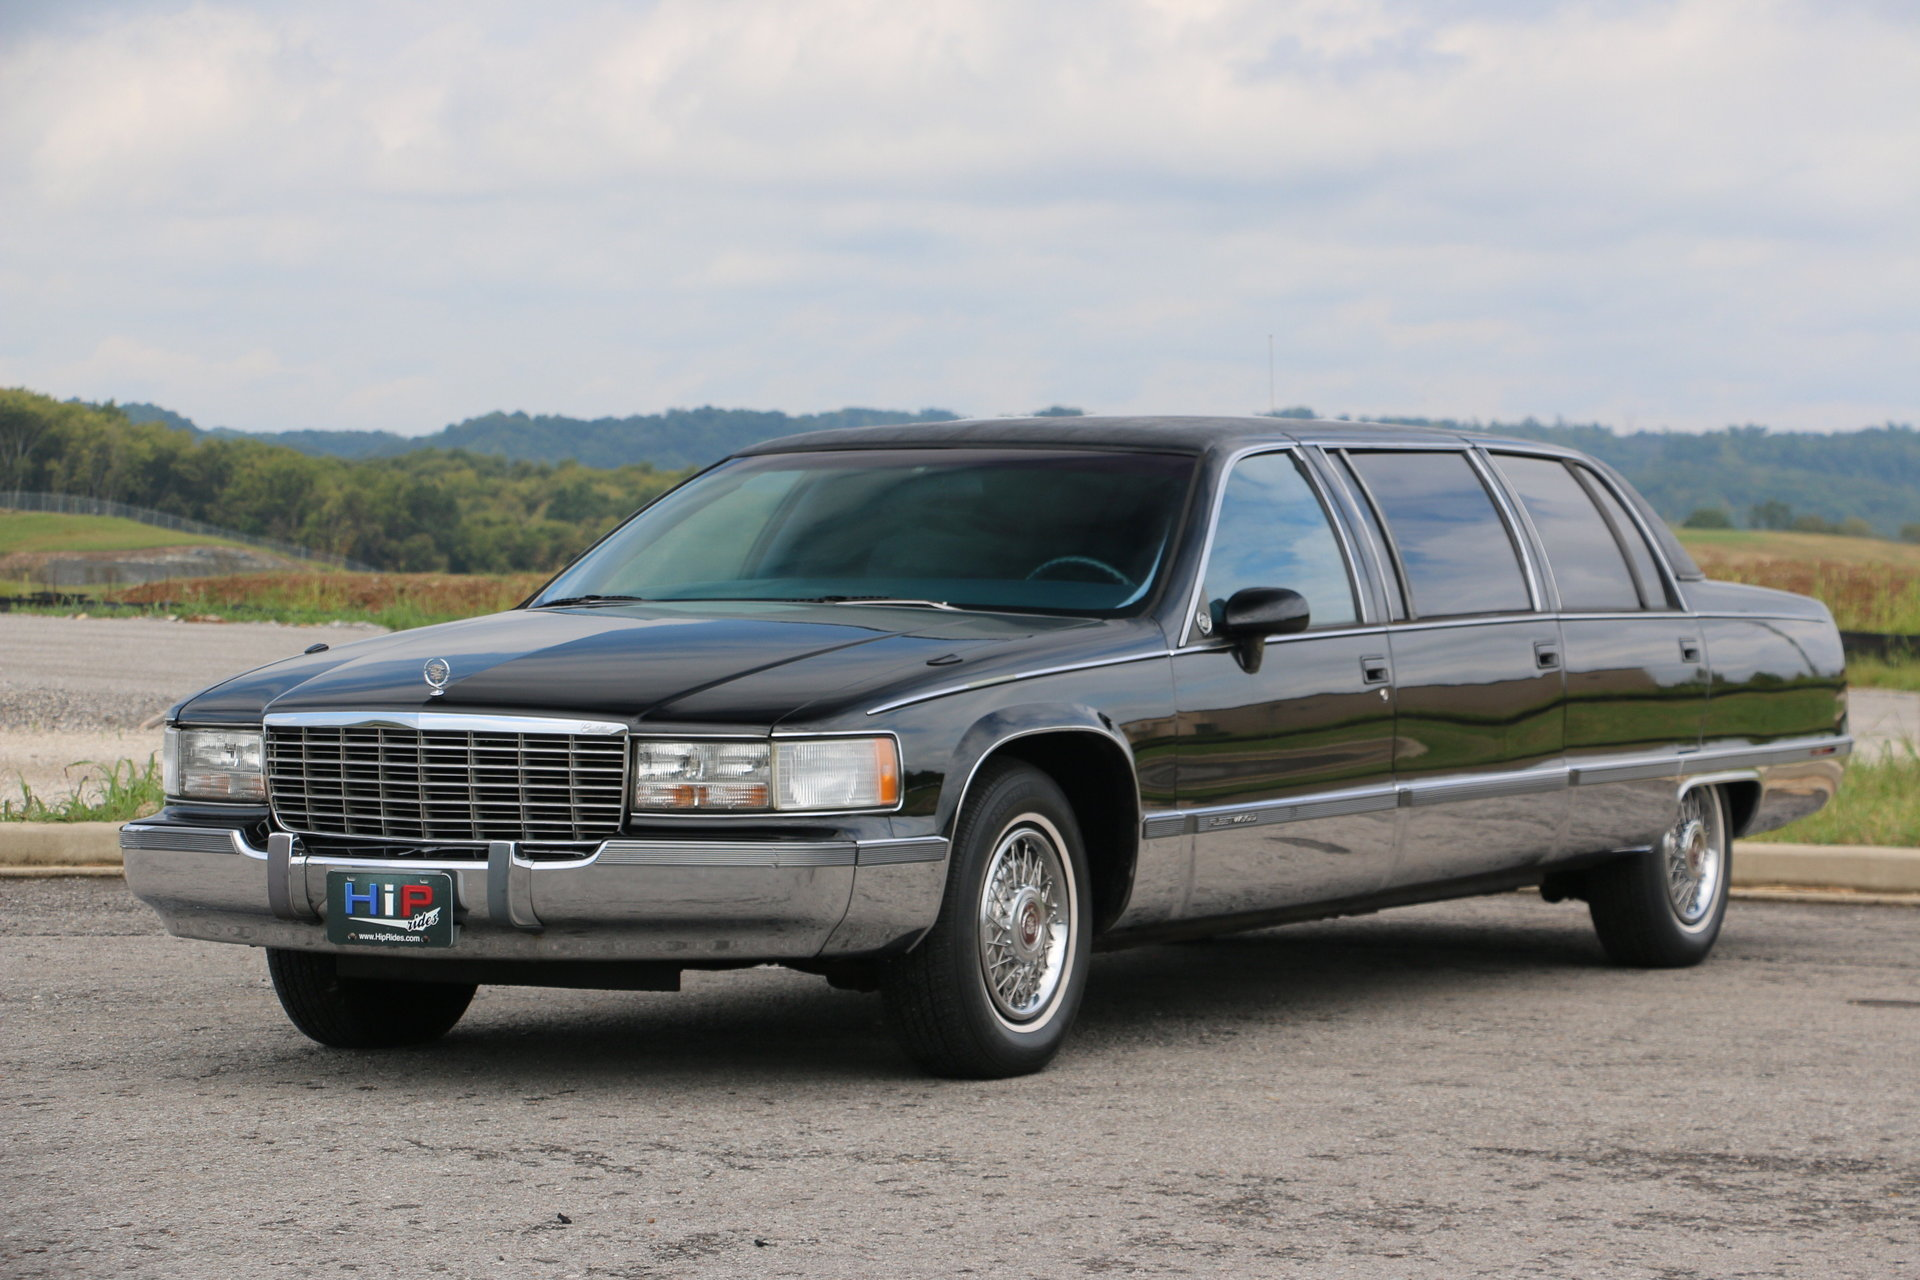 3106862bd538 hd 1993 cadillac fleetwood limousine